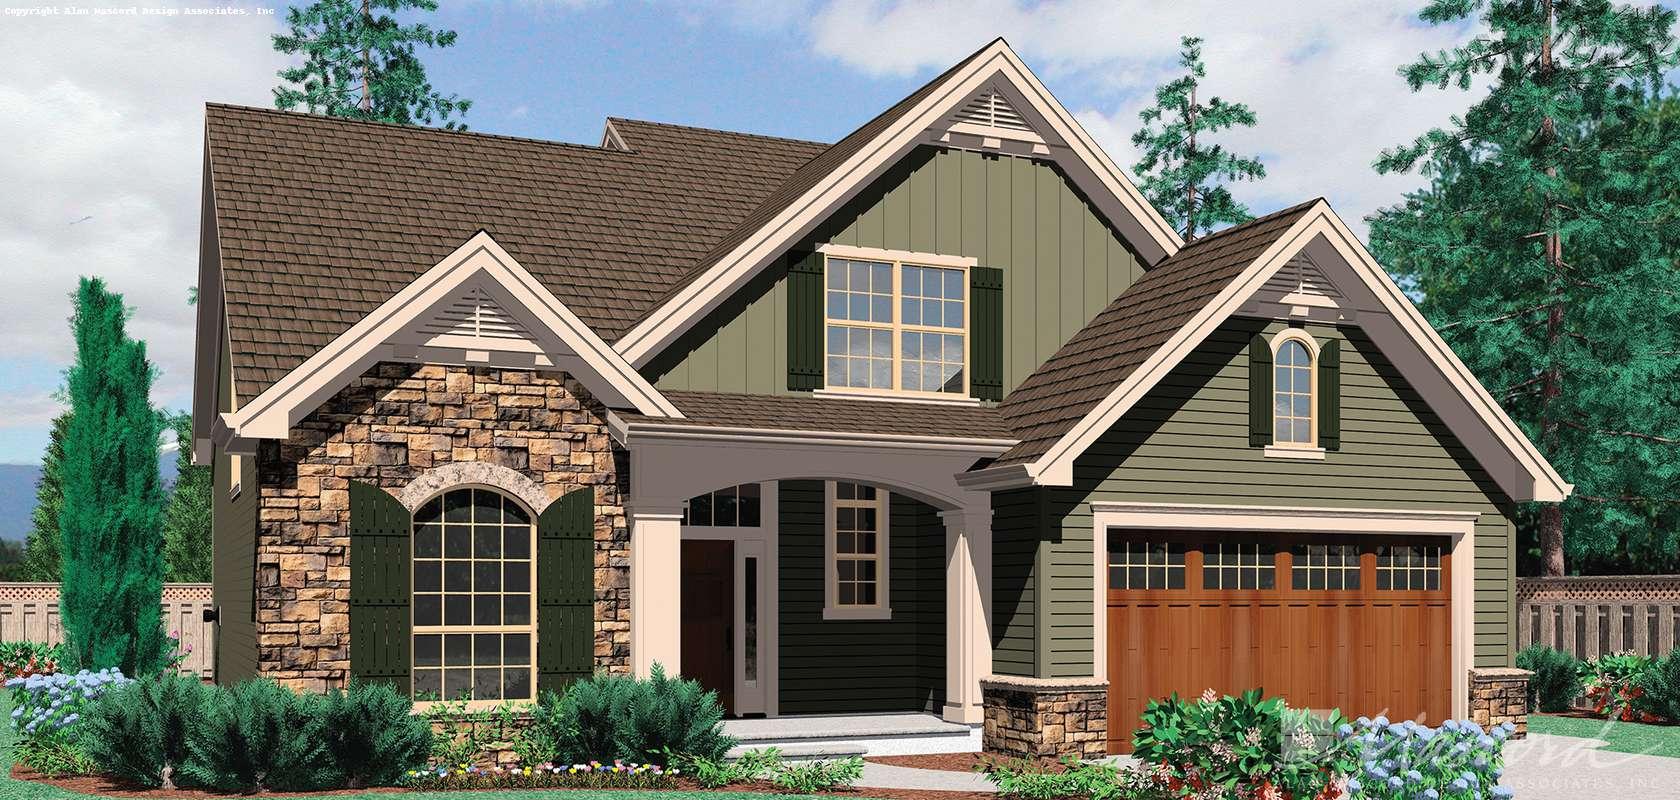 Mascord House Plan B22140: The Landon